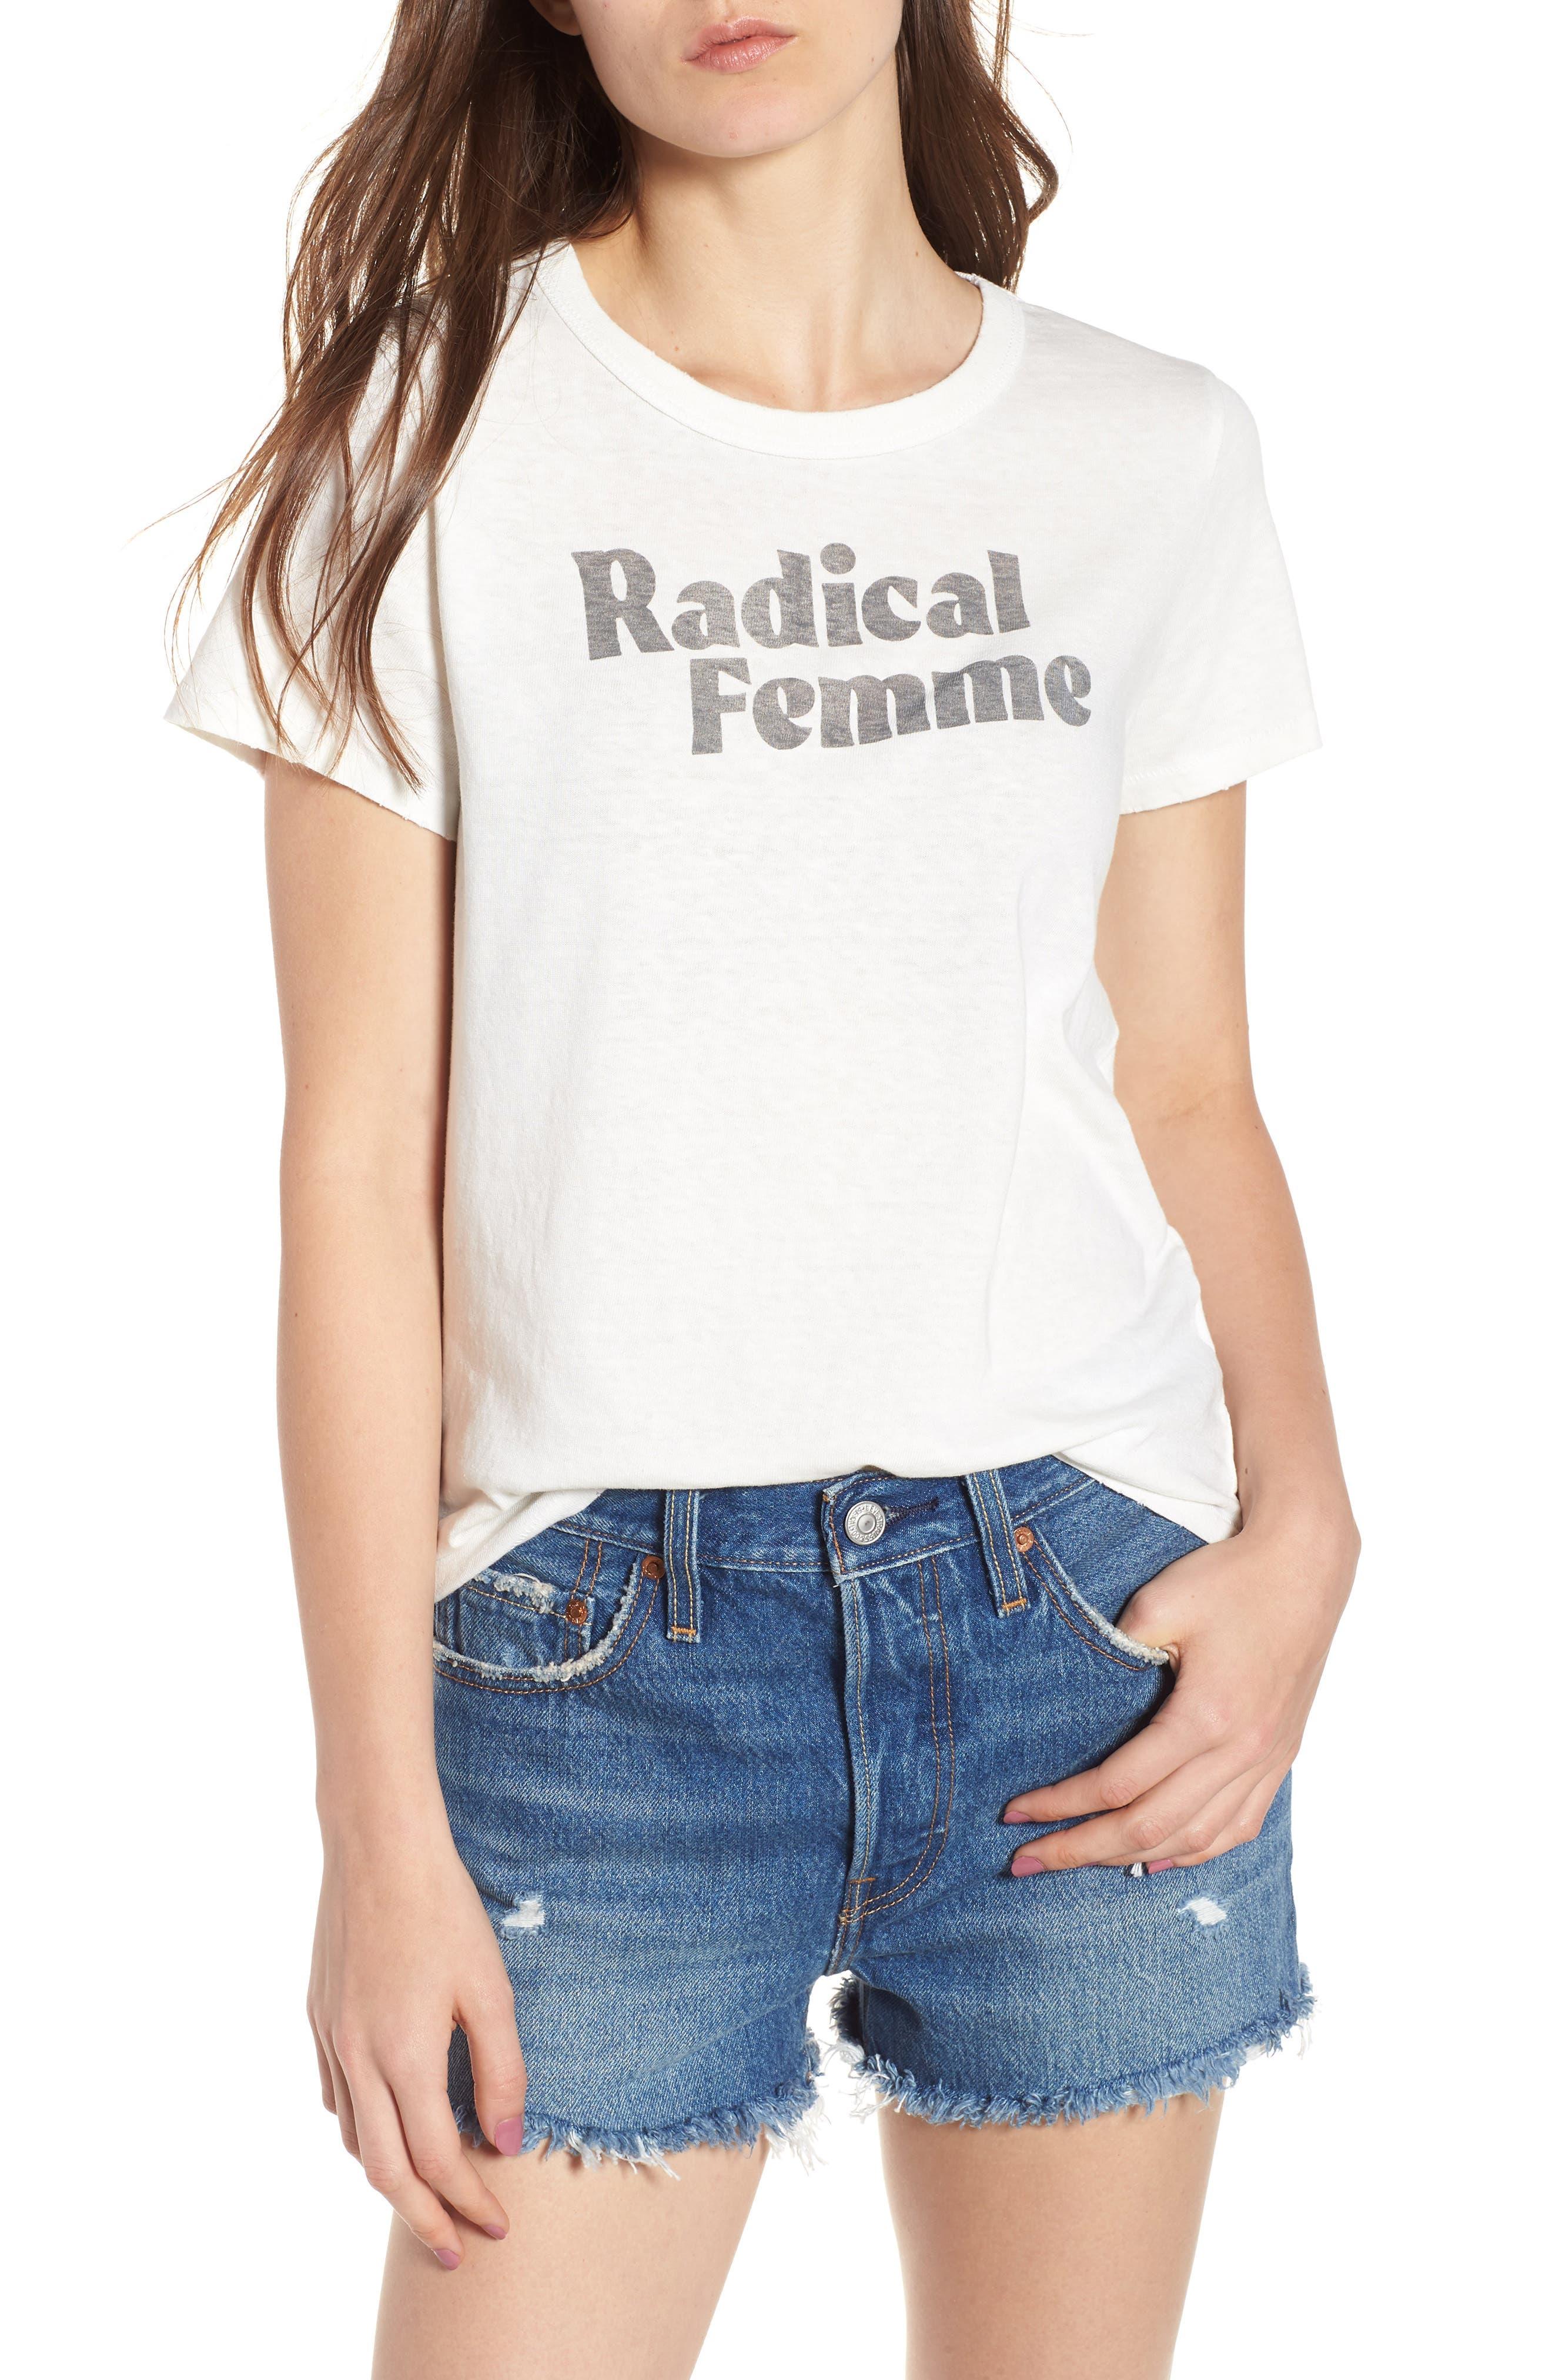 Radical Femme Tee,                         Main,                         color,